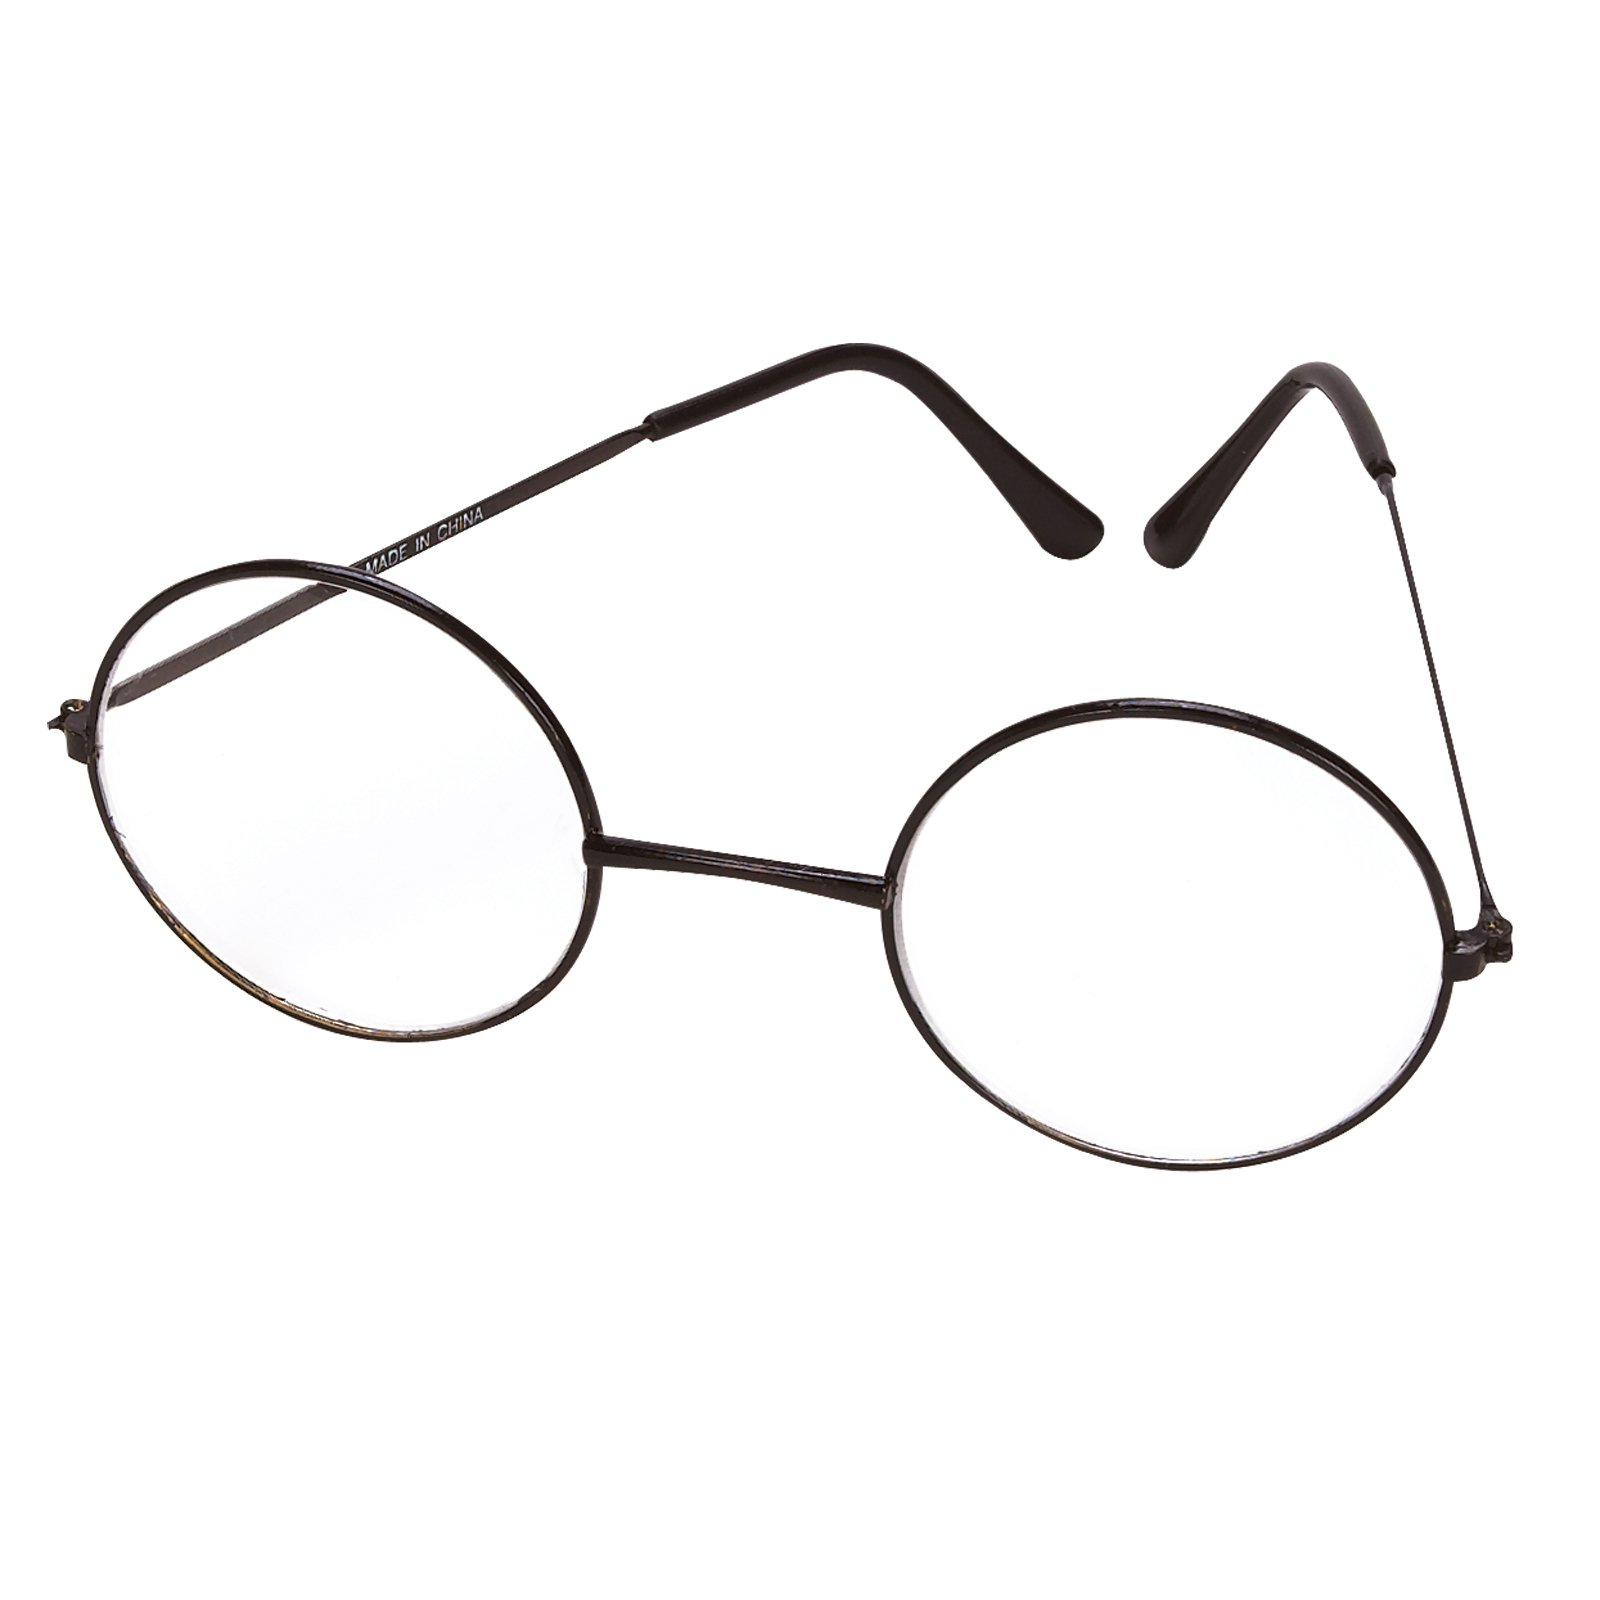 Fix Bent Frames on Glasses